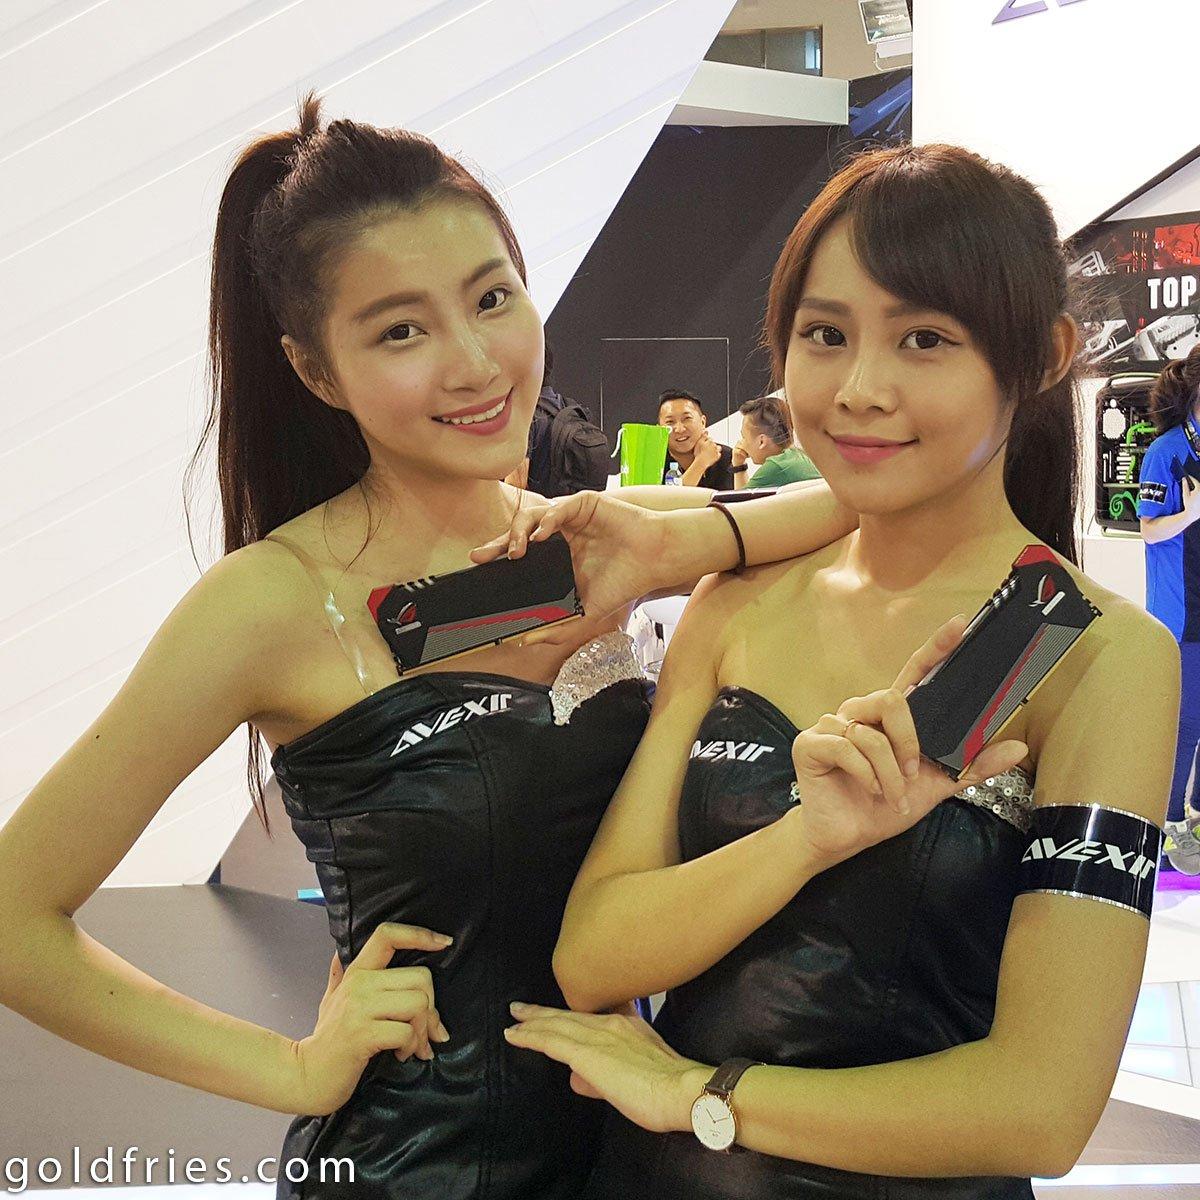 Booth Babes at Computex 2015